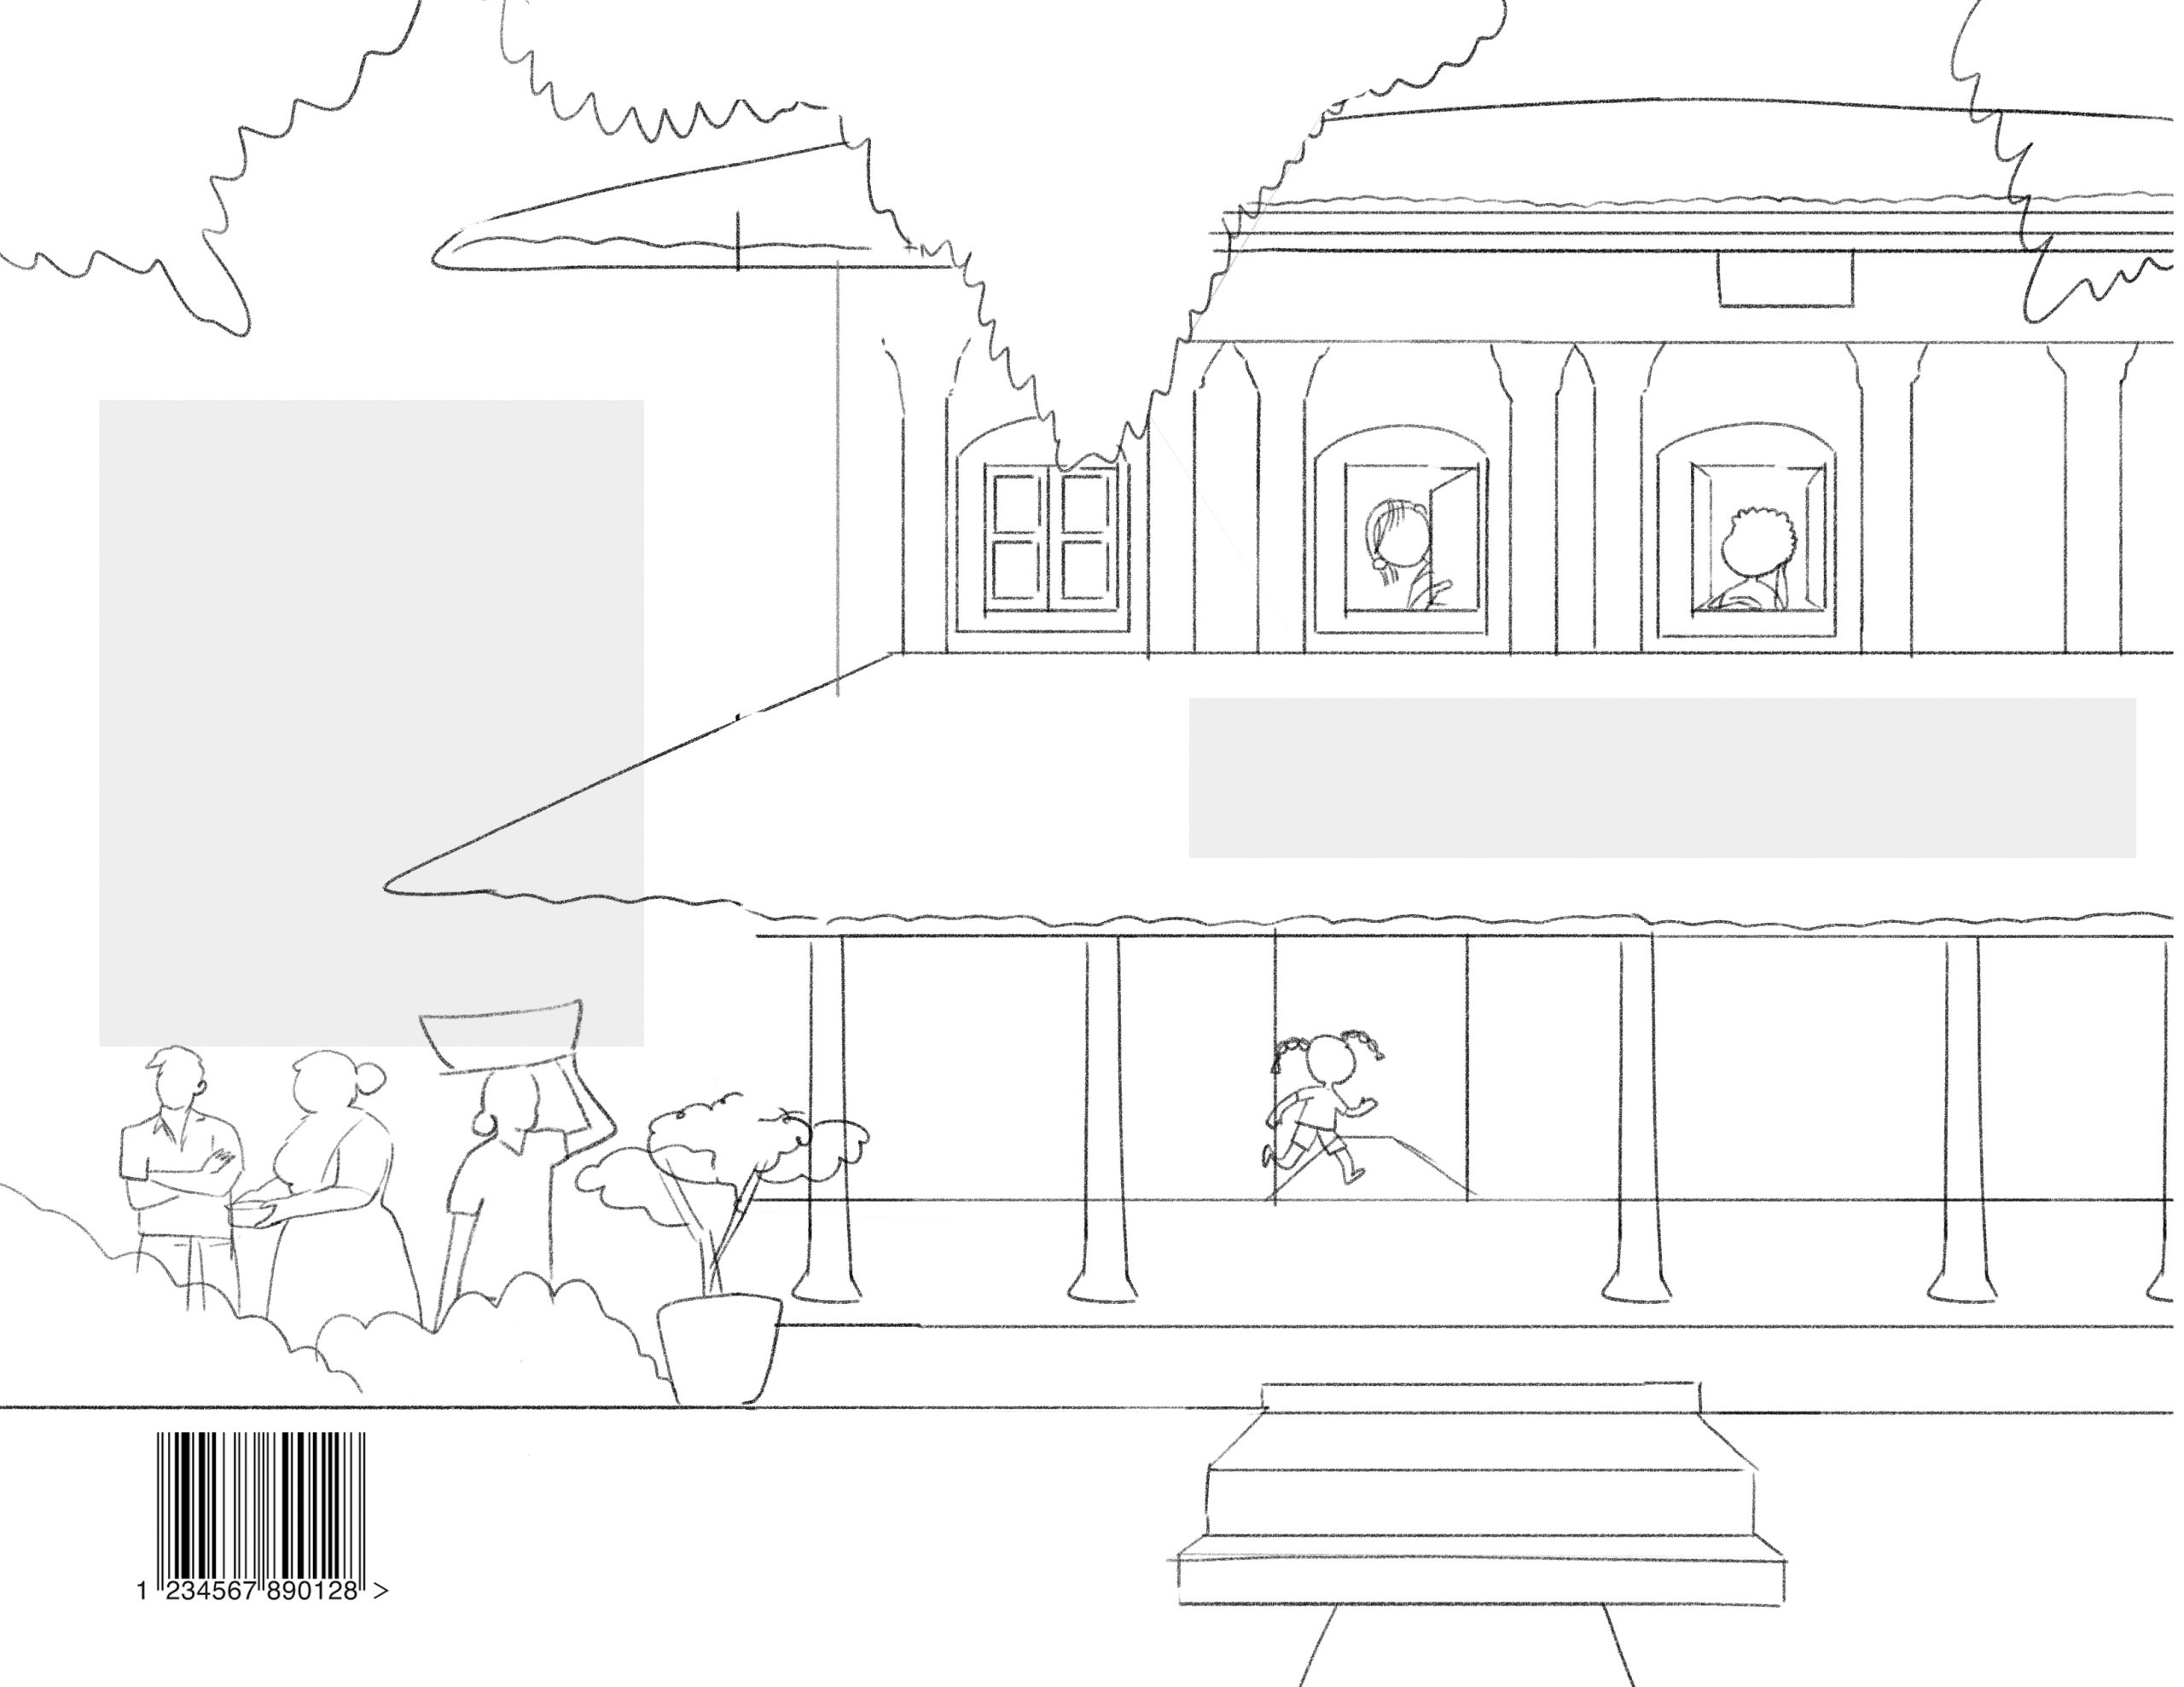 A mystery at Lili Villa Concept Sketches